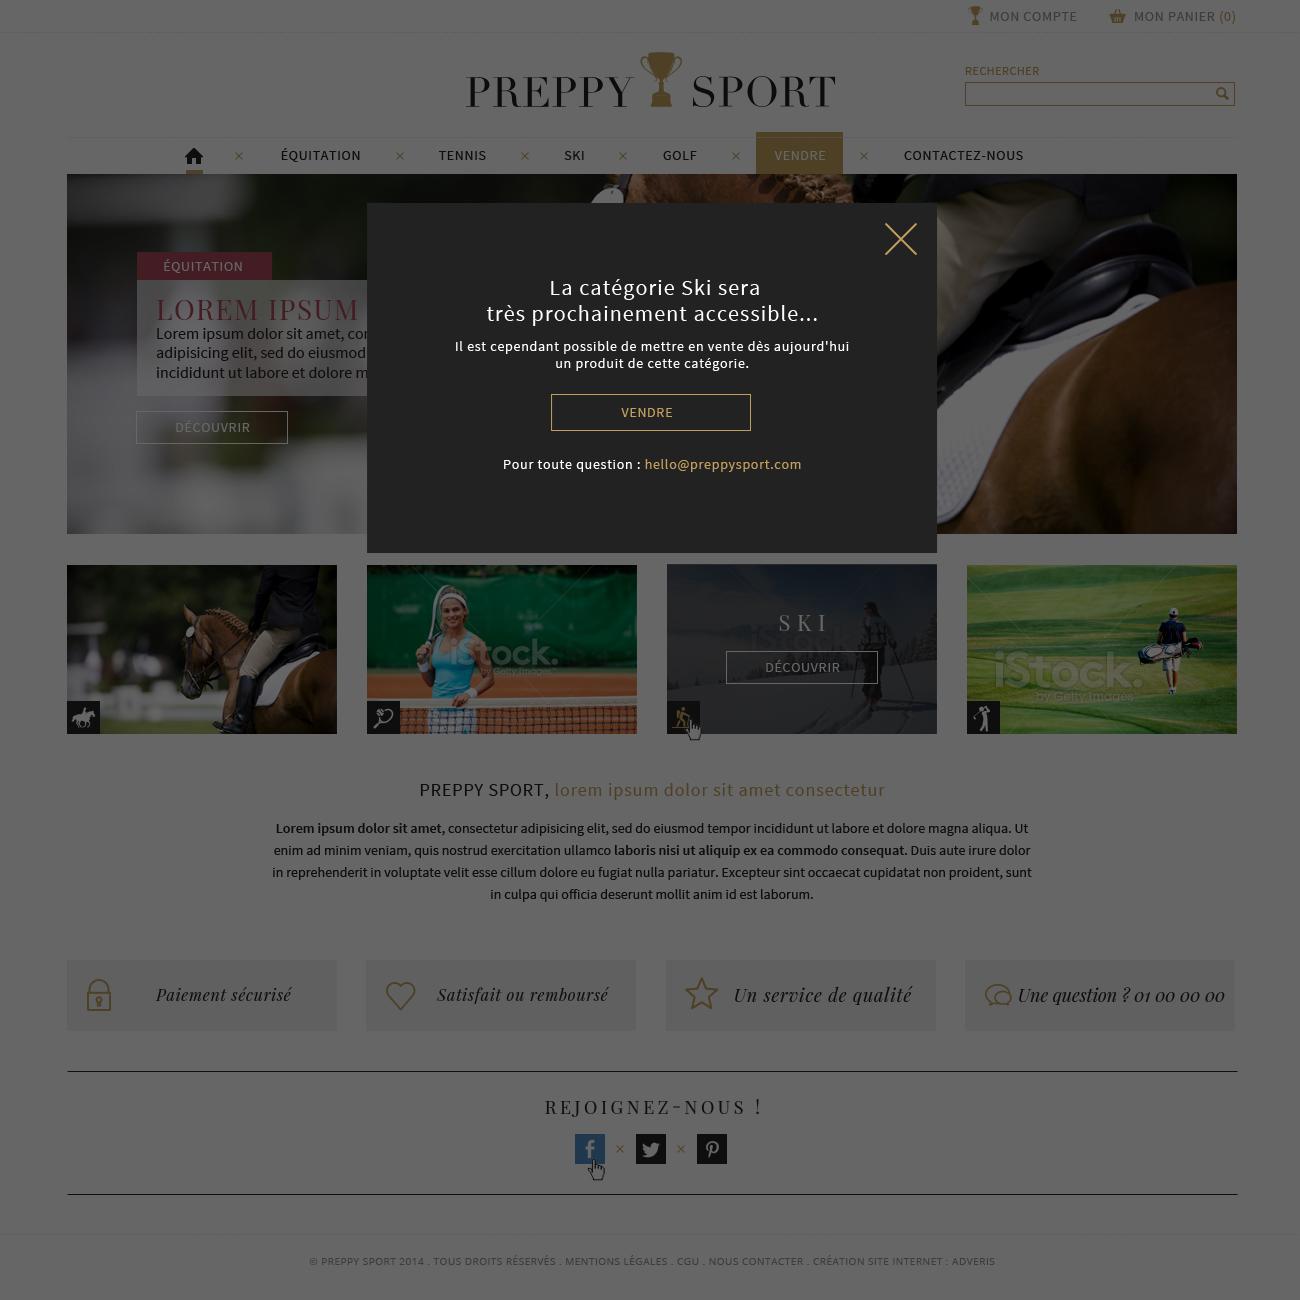 preppysport-accueil_popup